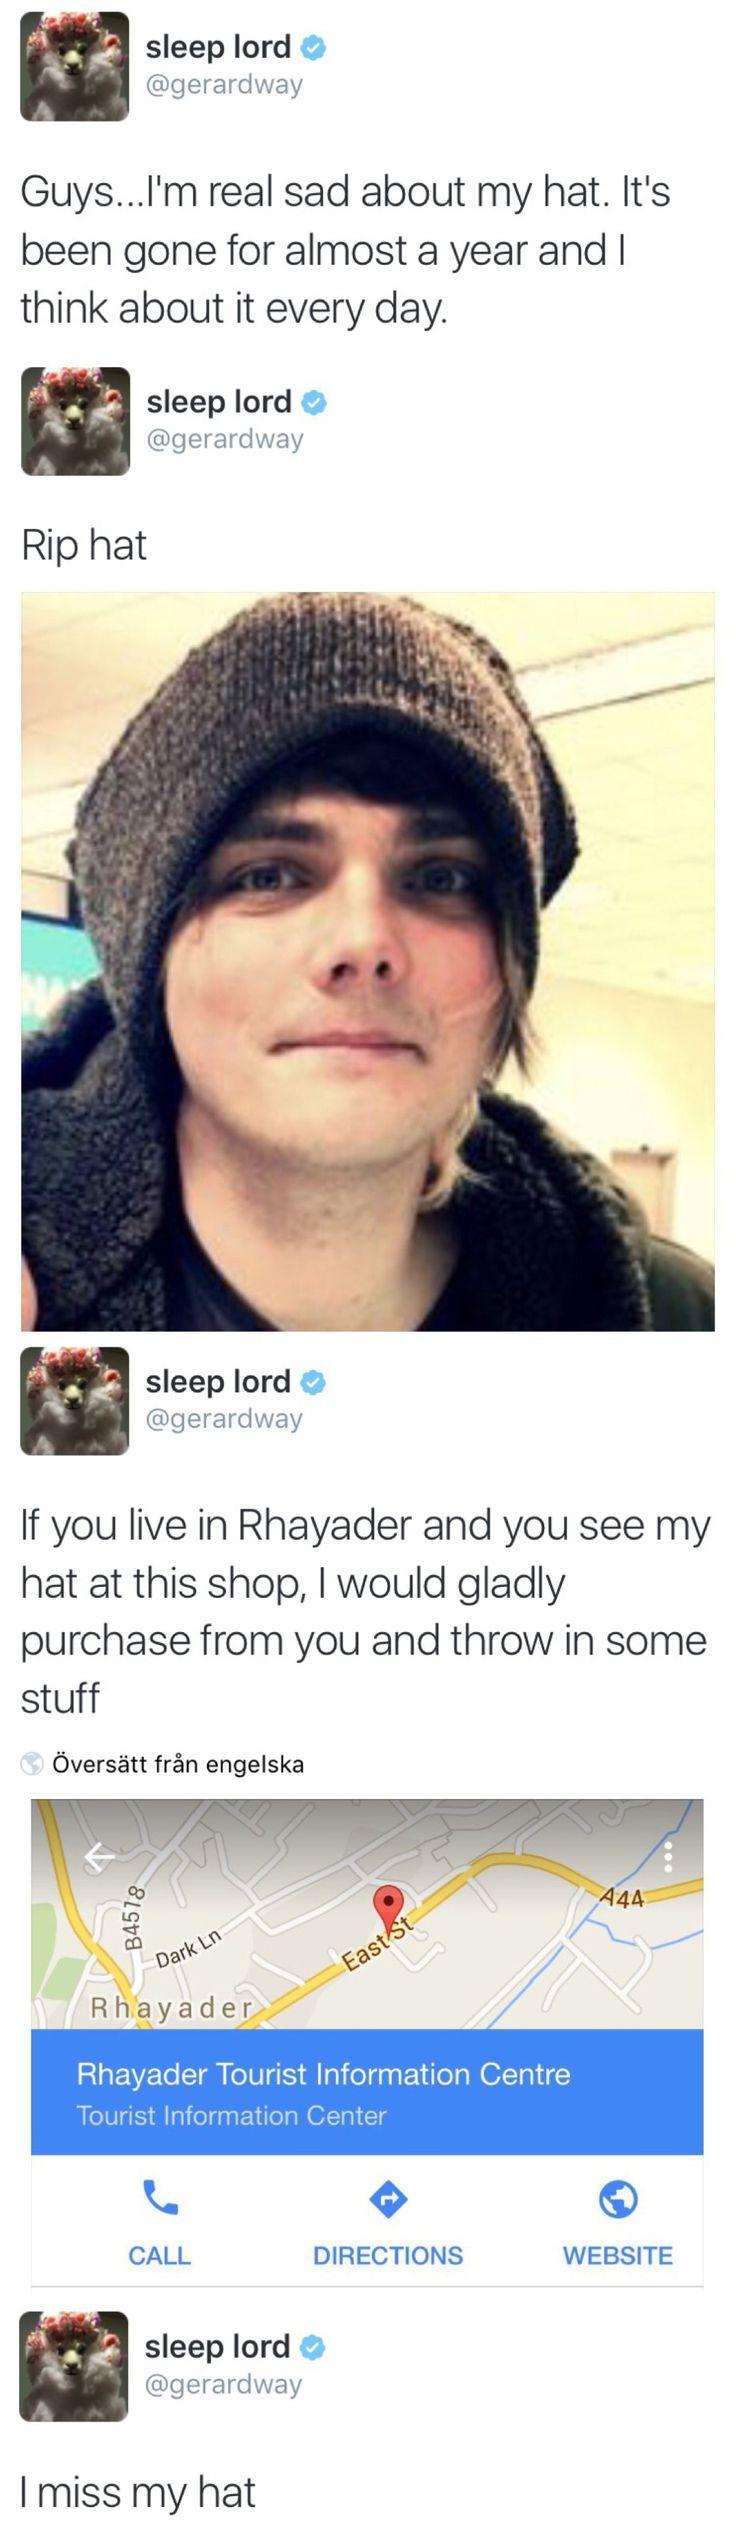 it's okay, gerard. I miss your hat too  #RePin by AT Social Media Marketing - Pinterest Marketing Specialists ATSocialMedia.co.uk